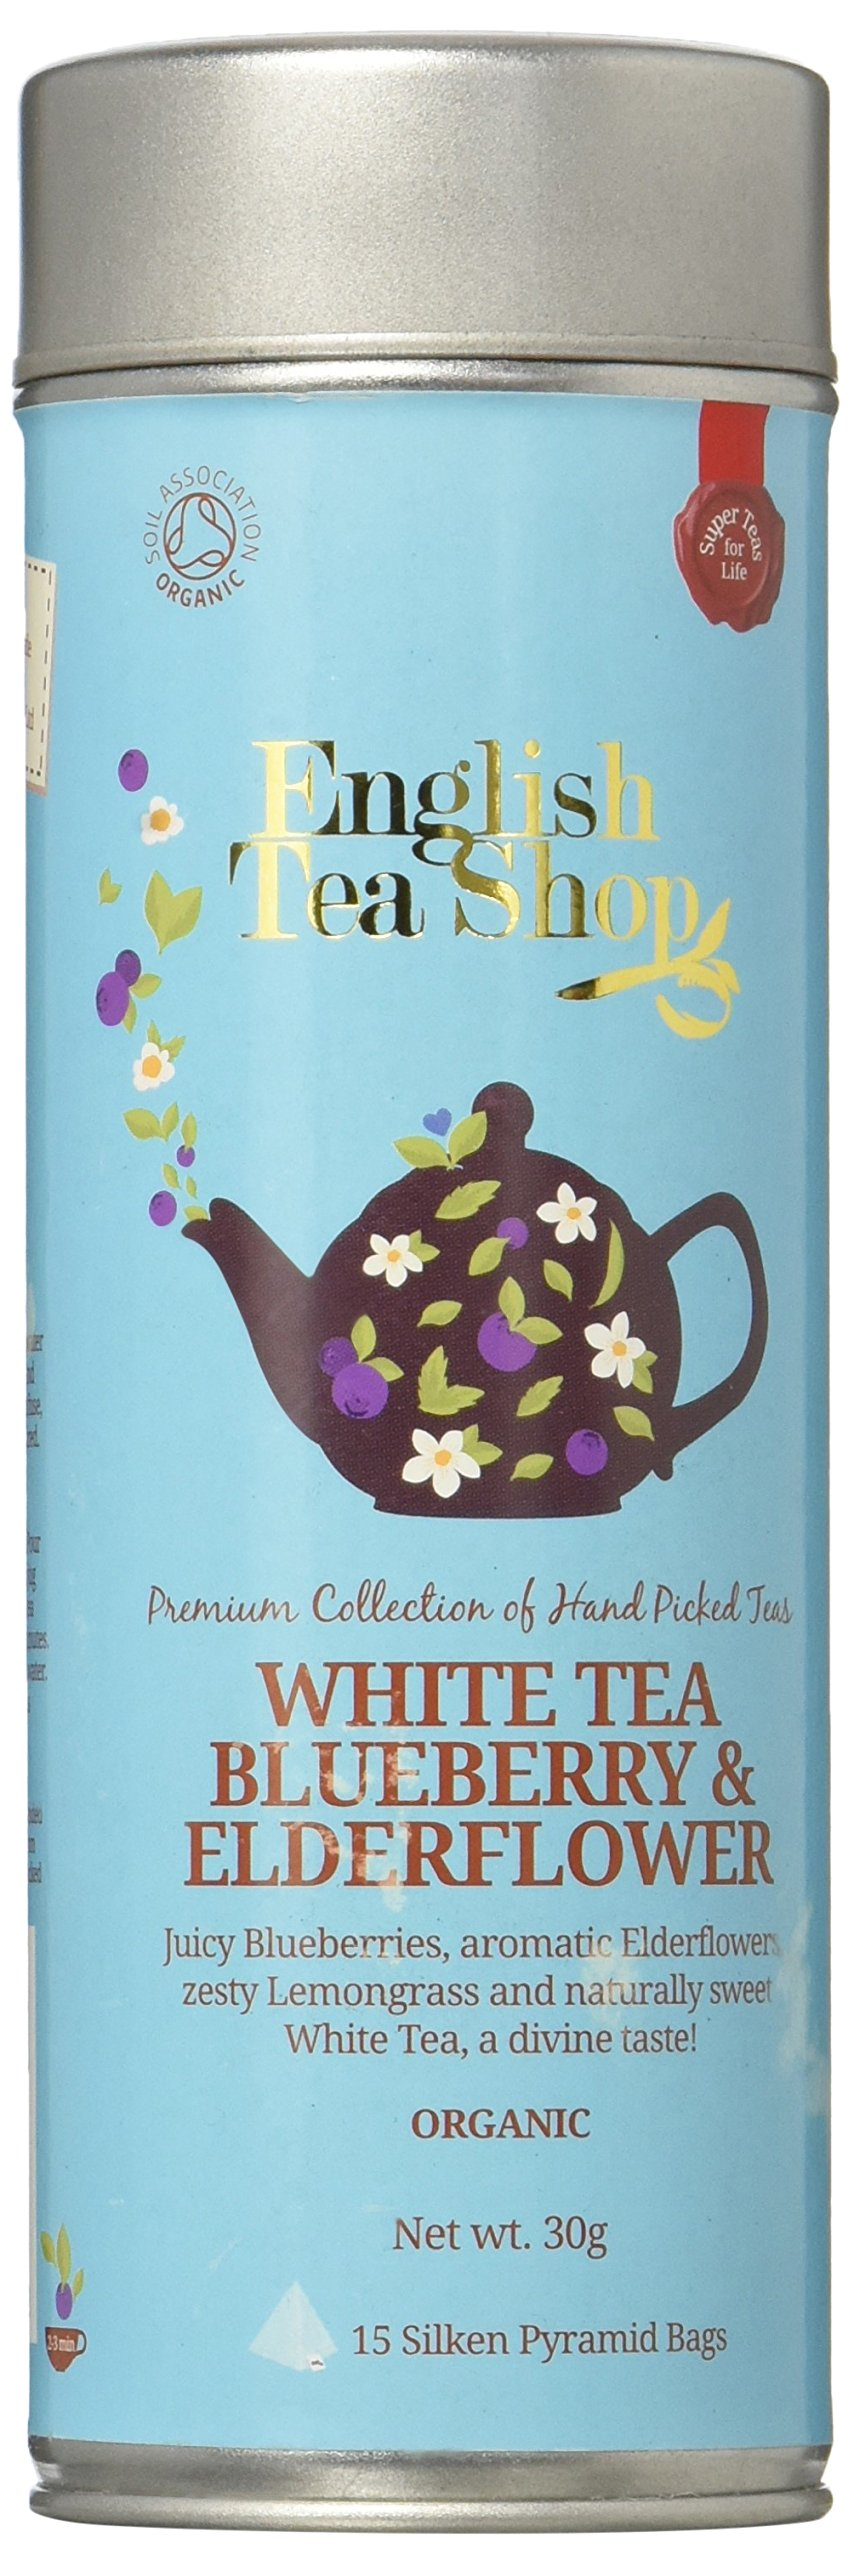 English Tea Shop White Tea Blueberry and Elderflower Jeff Can Super Soilon Pyramid, 30 Gram